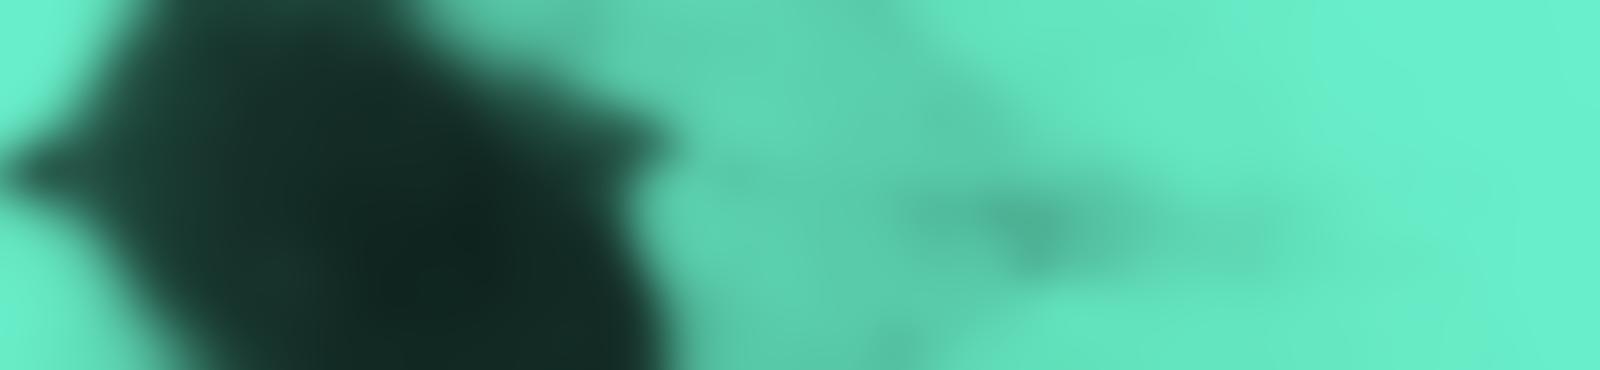 Blurred ceeacf00 9e34 4e93 9716 a0470ce7904b